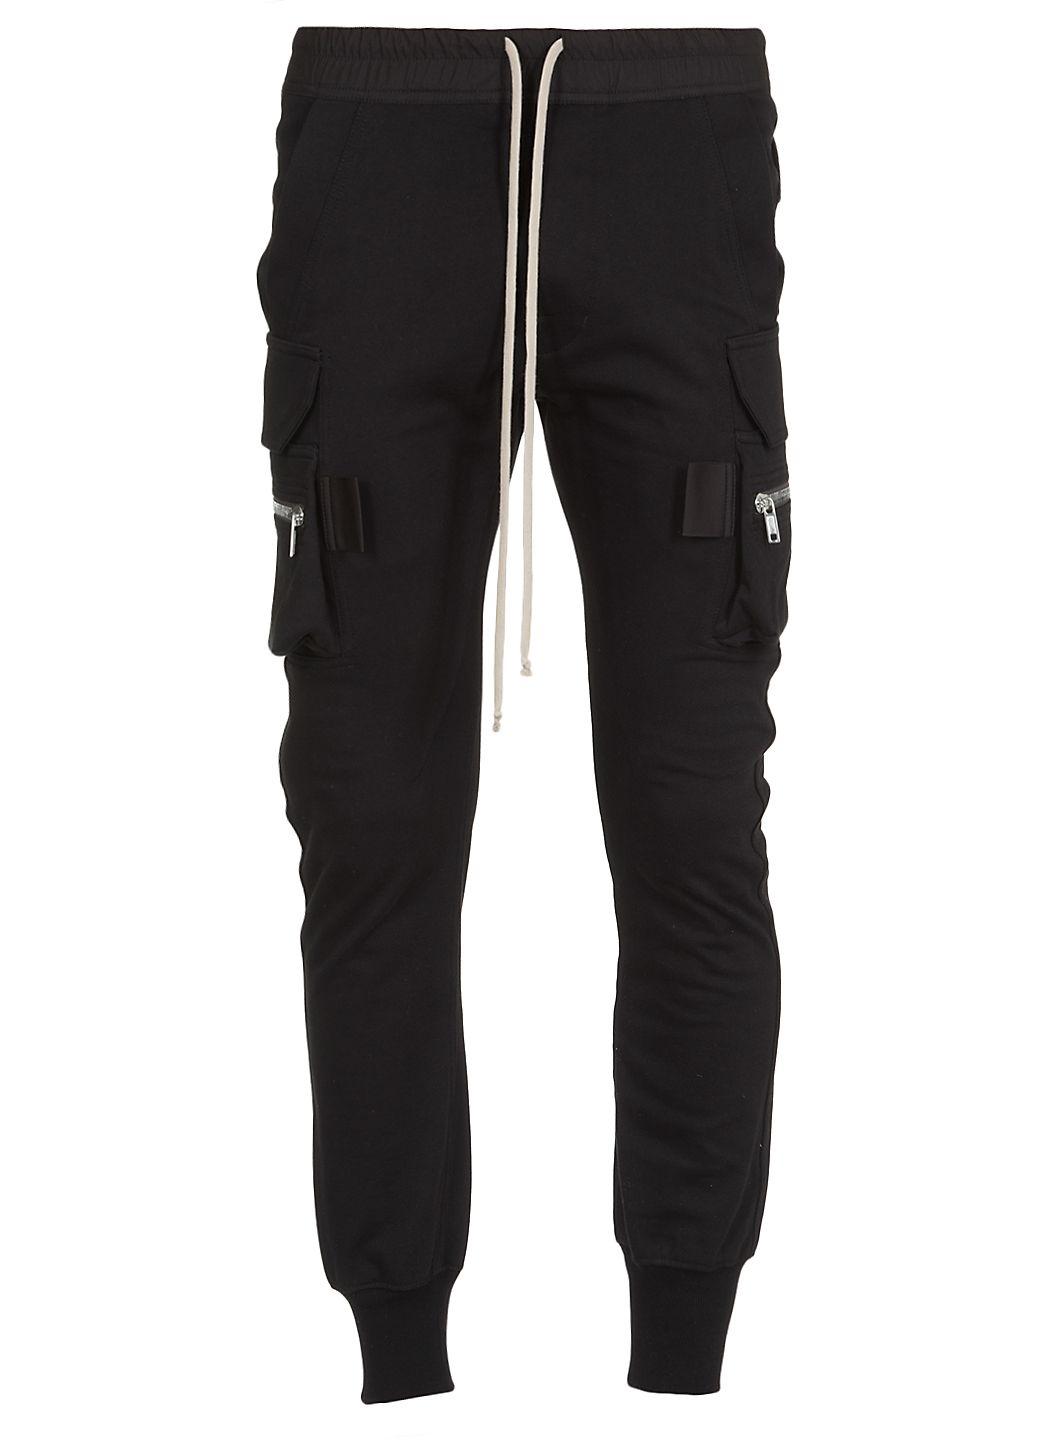 Pantalone Mastodon cargo